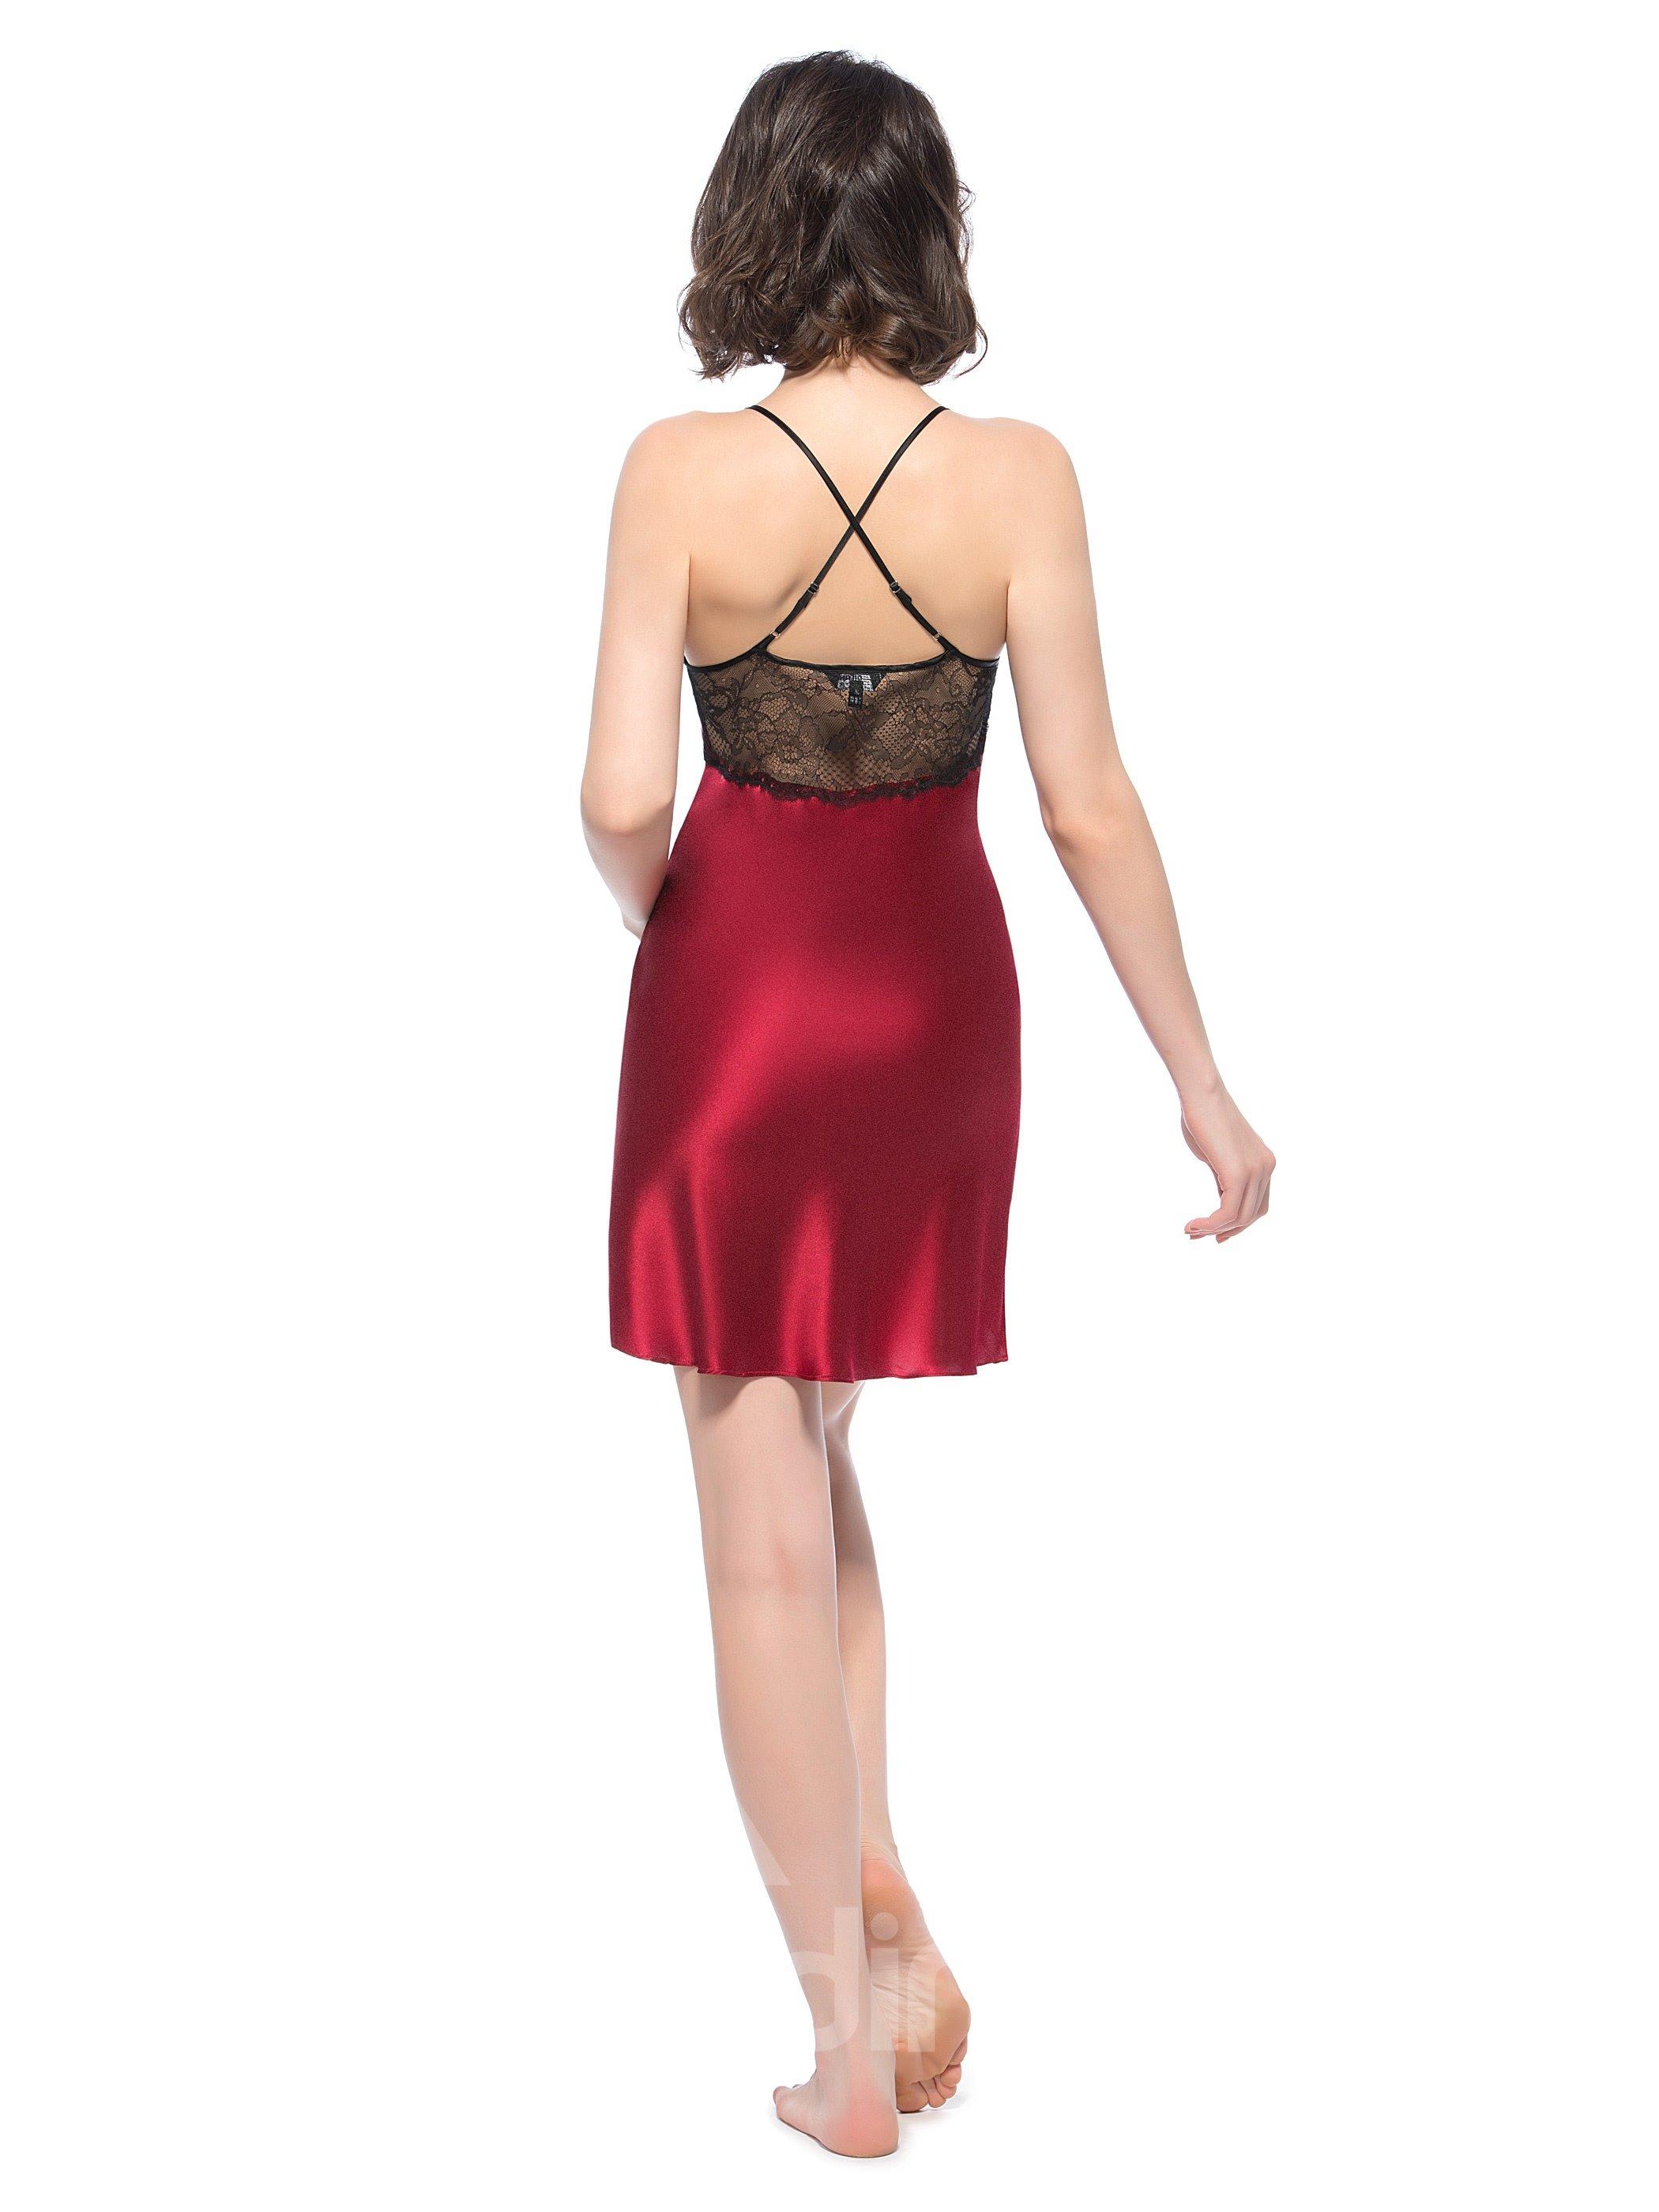 Elegant Lace Along Hip and Waist Spahetti Straps Silk Chemise